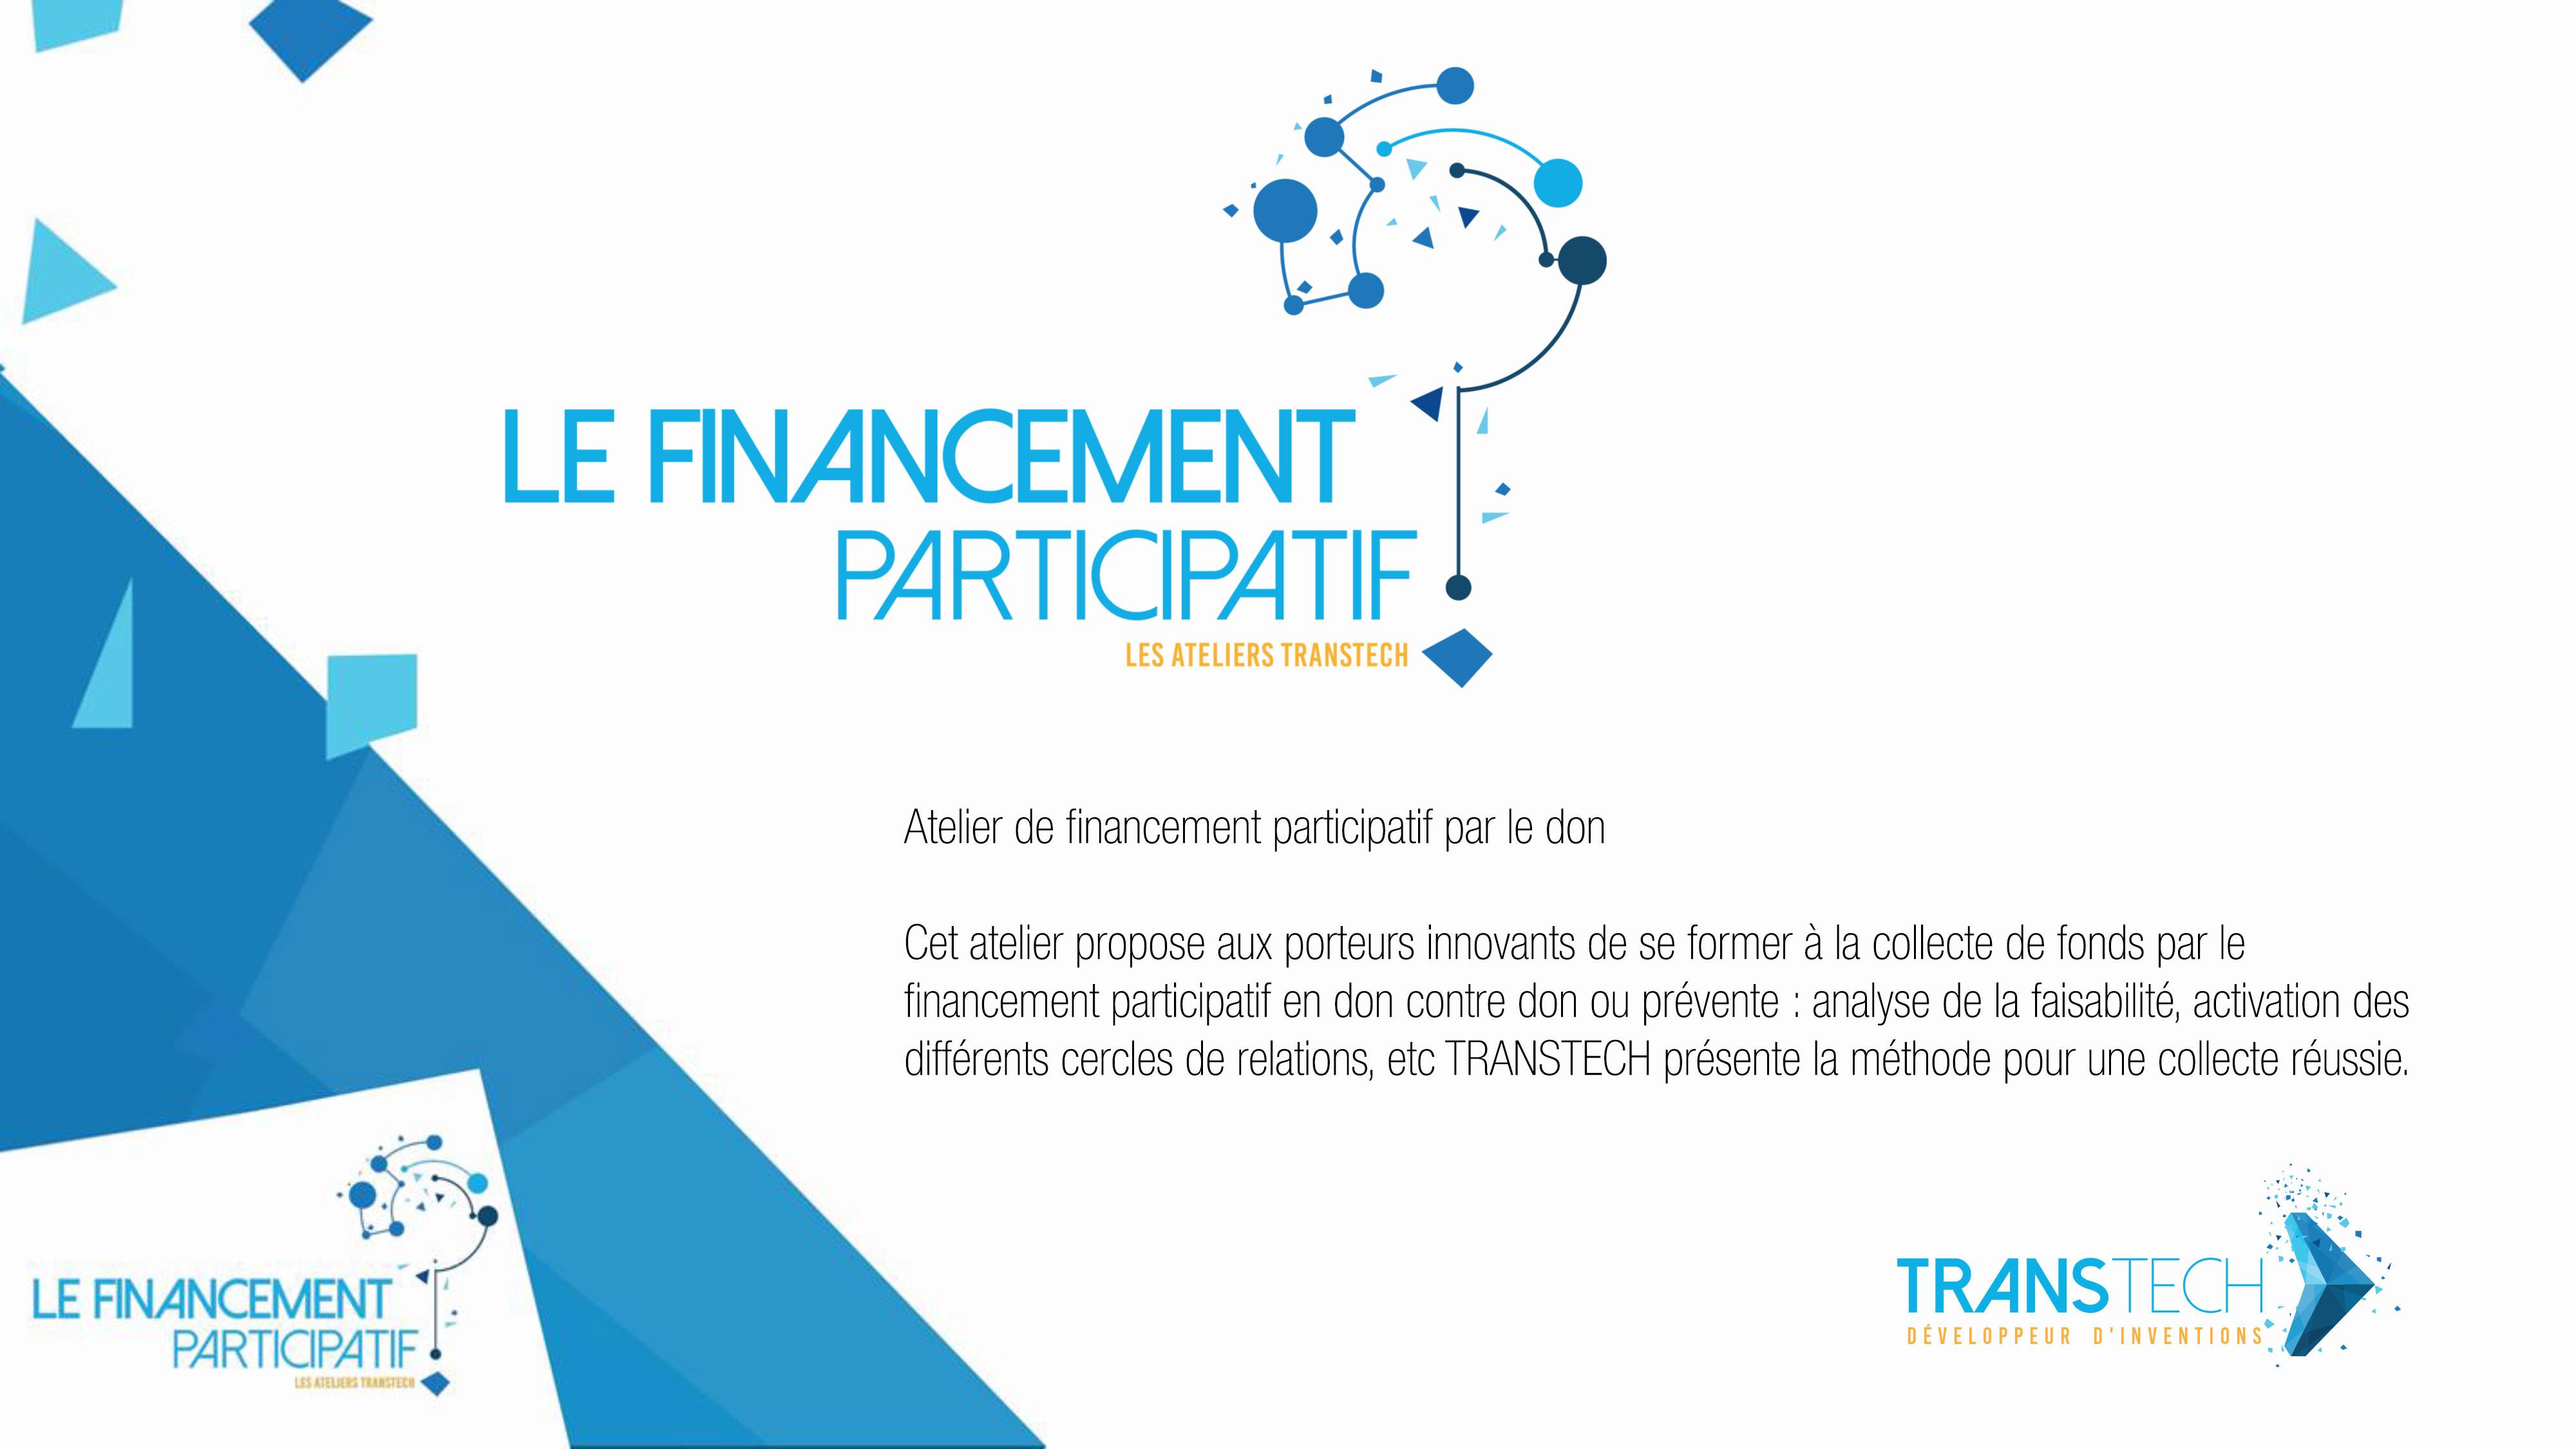 financement participatif Transtech